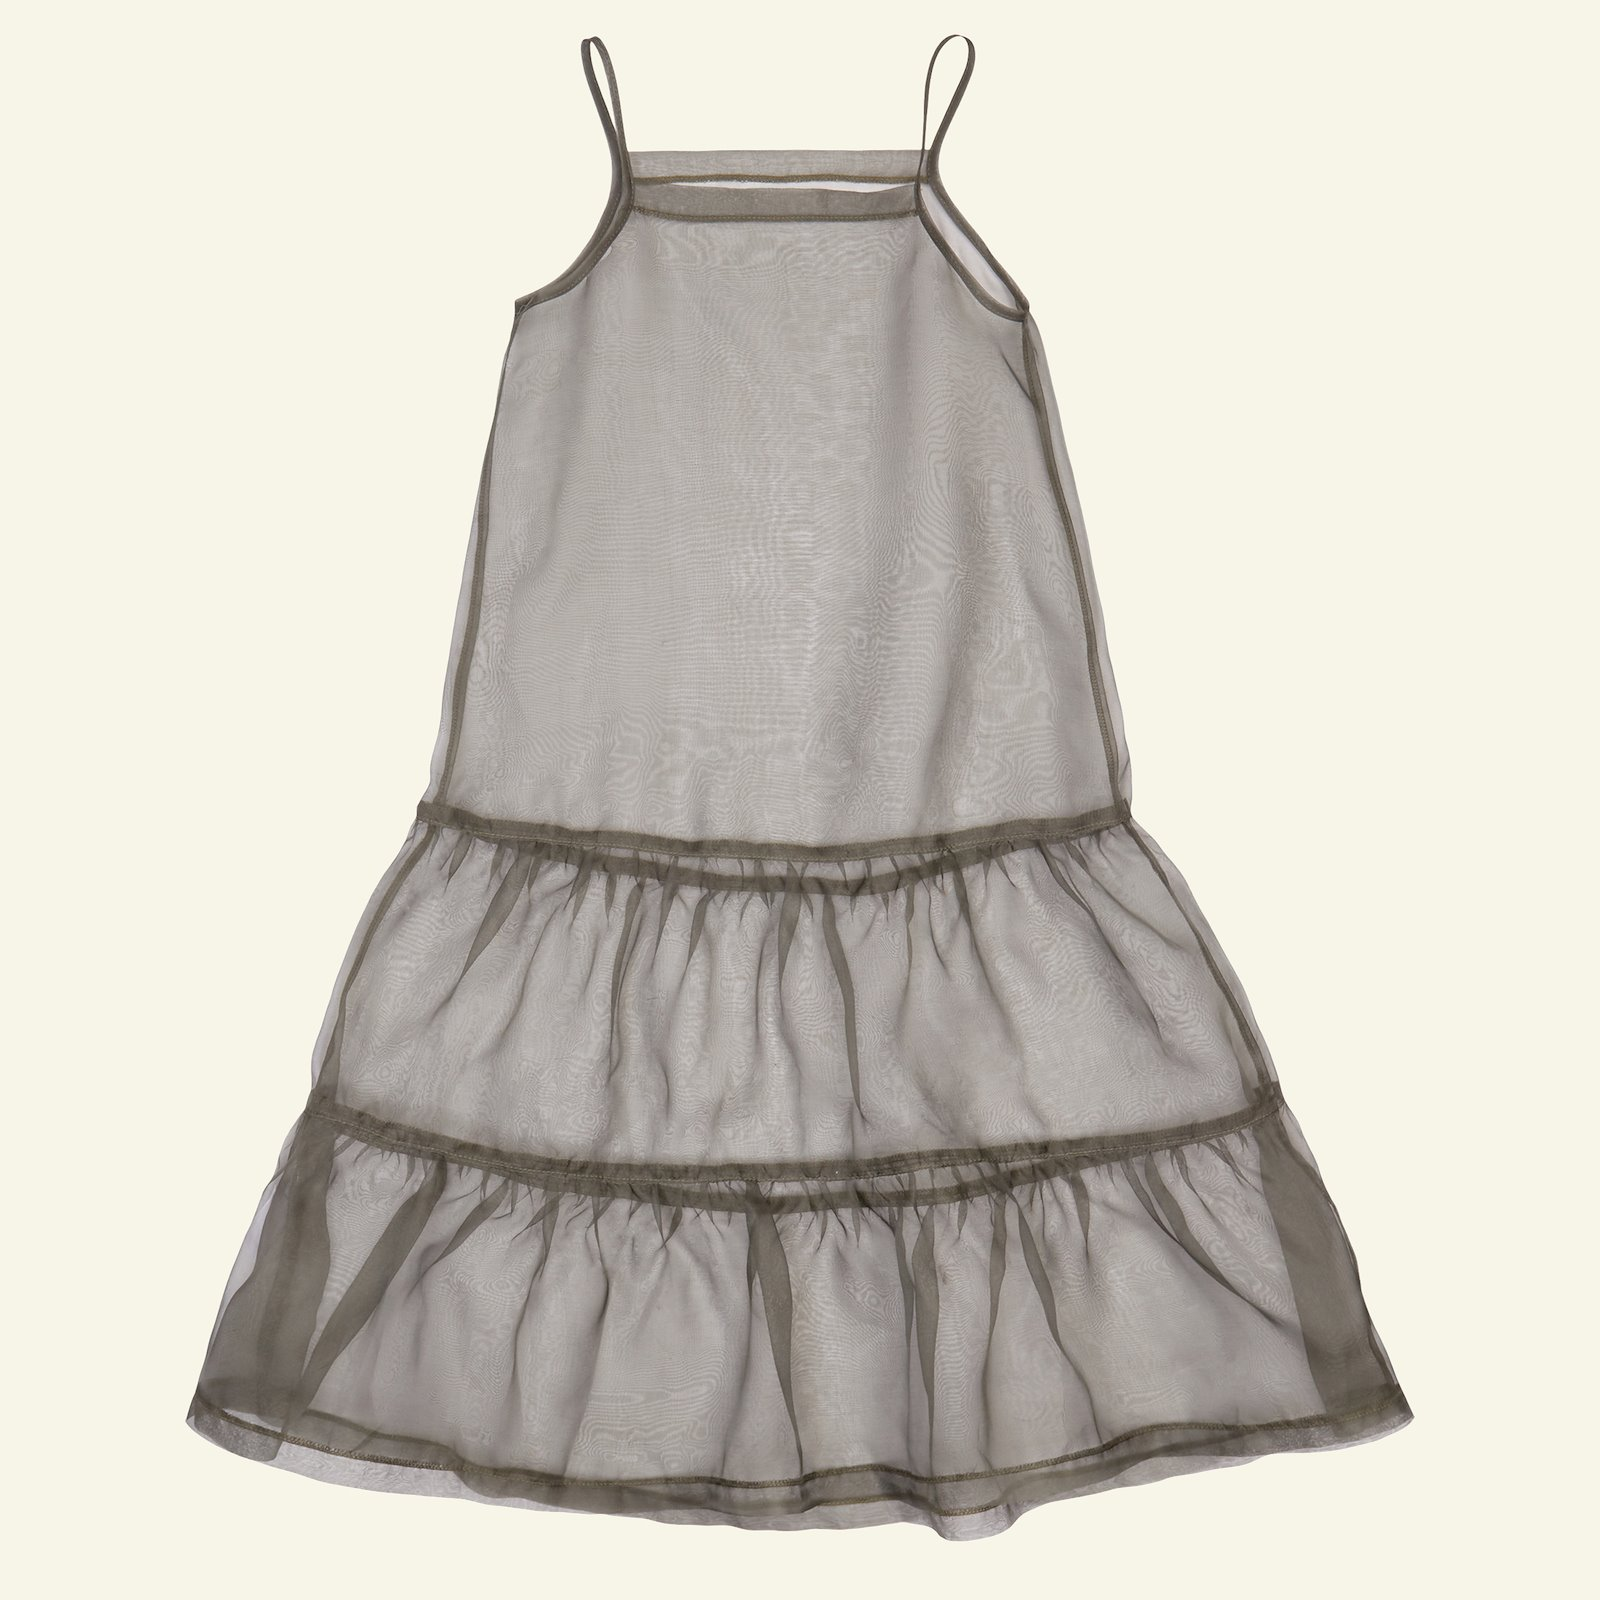 Flounce dress, 134/9y p63062_530439_sskit